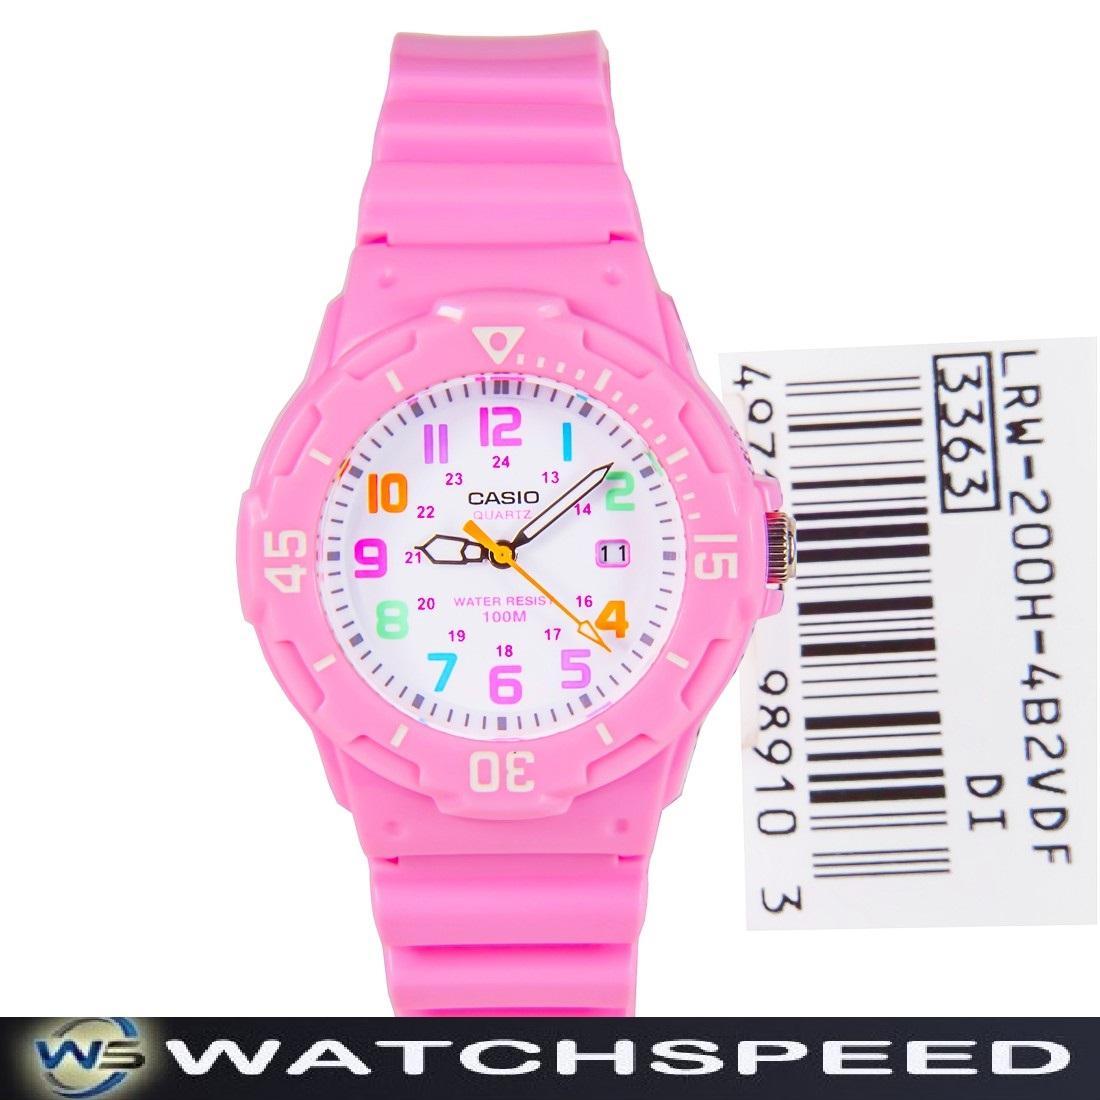 c631369b1 Casio LRW-200H-4B2 LRW200H-4B2 Pink Resin 100M Ladies / Womens Watch